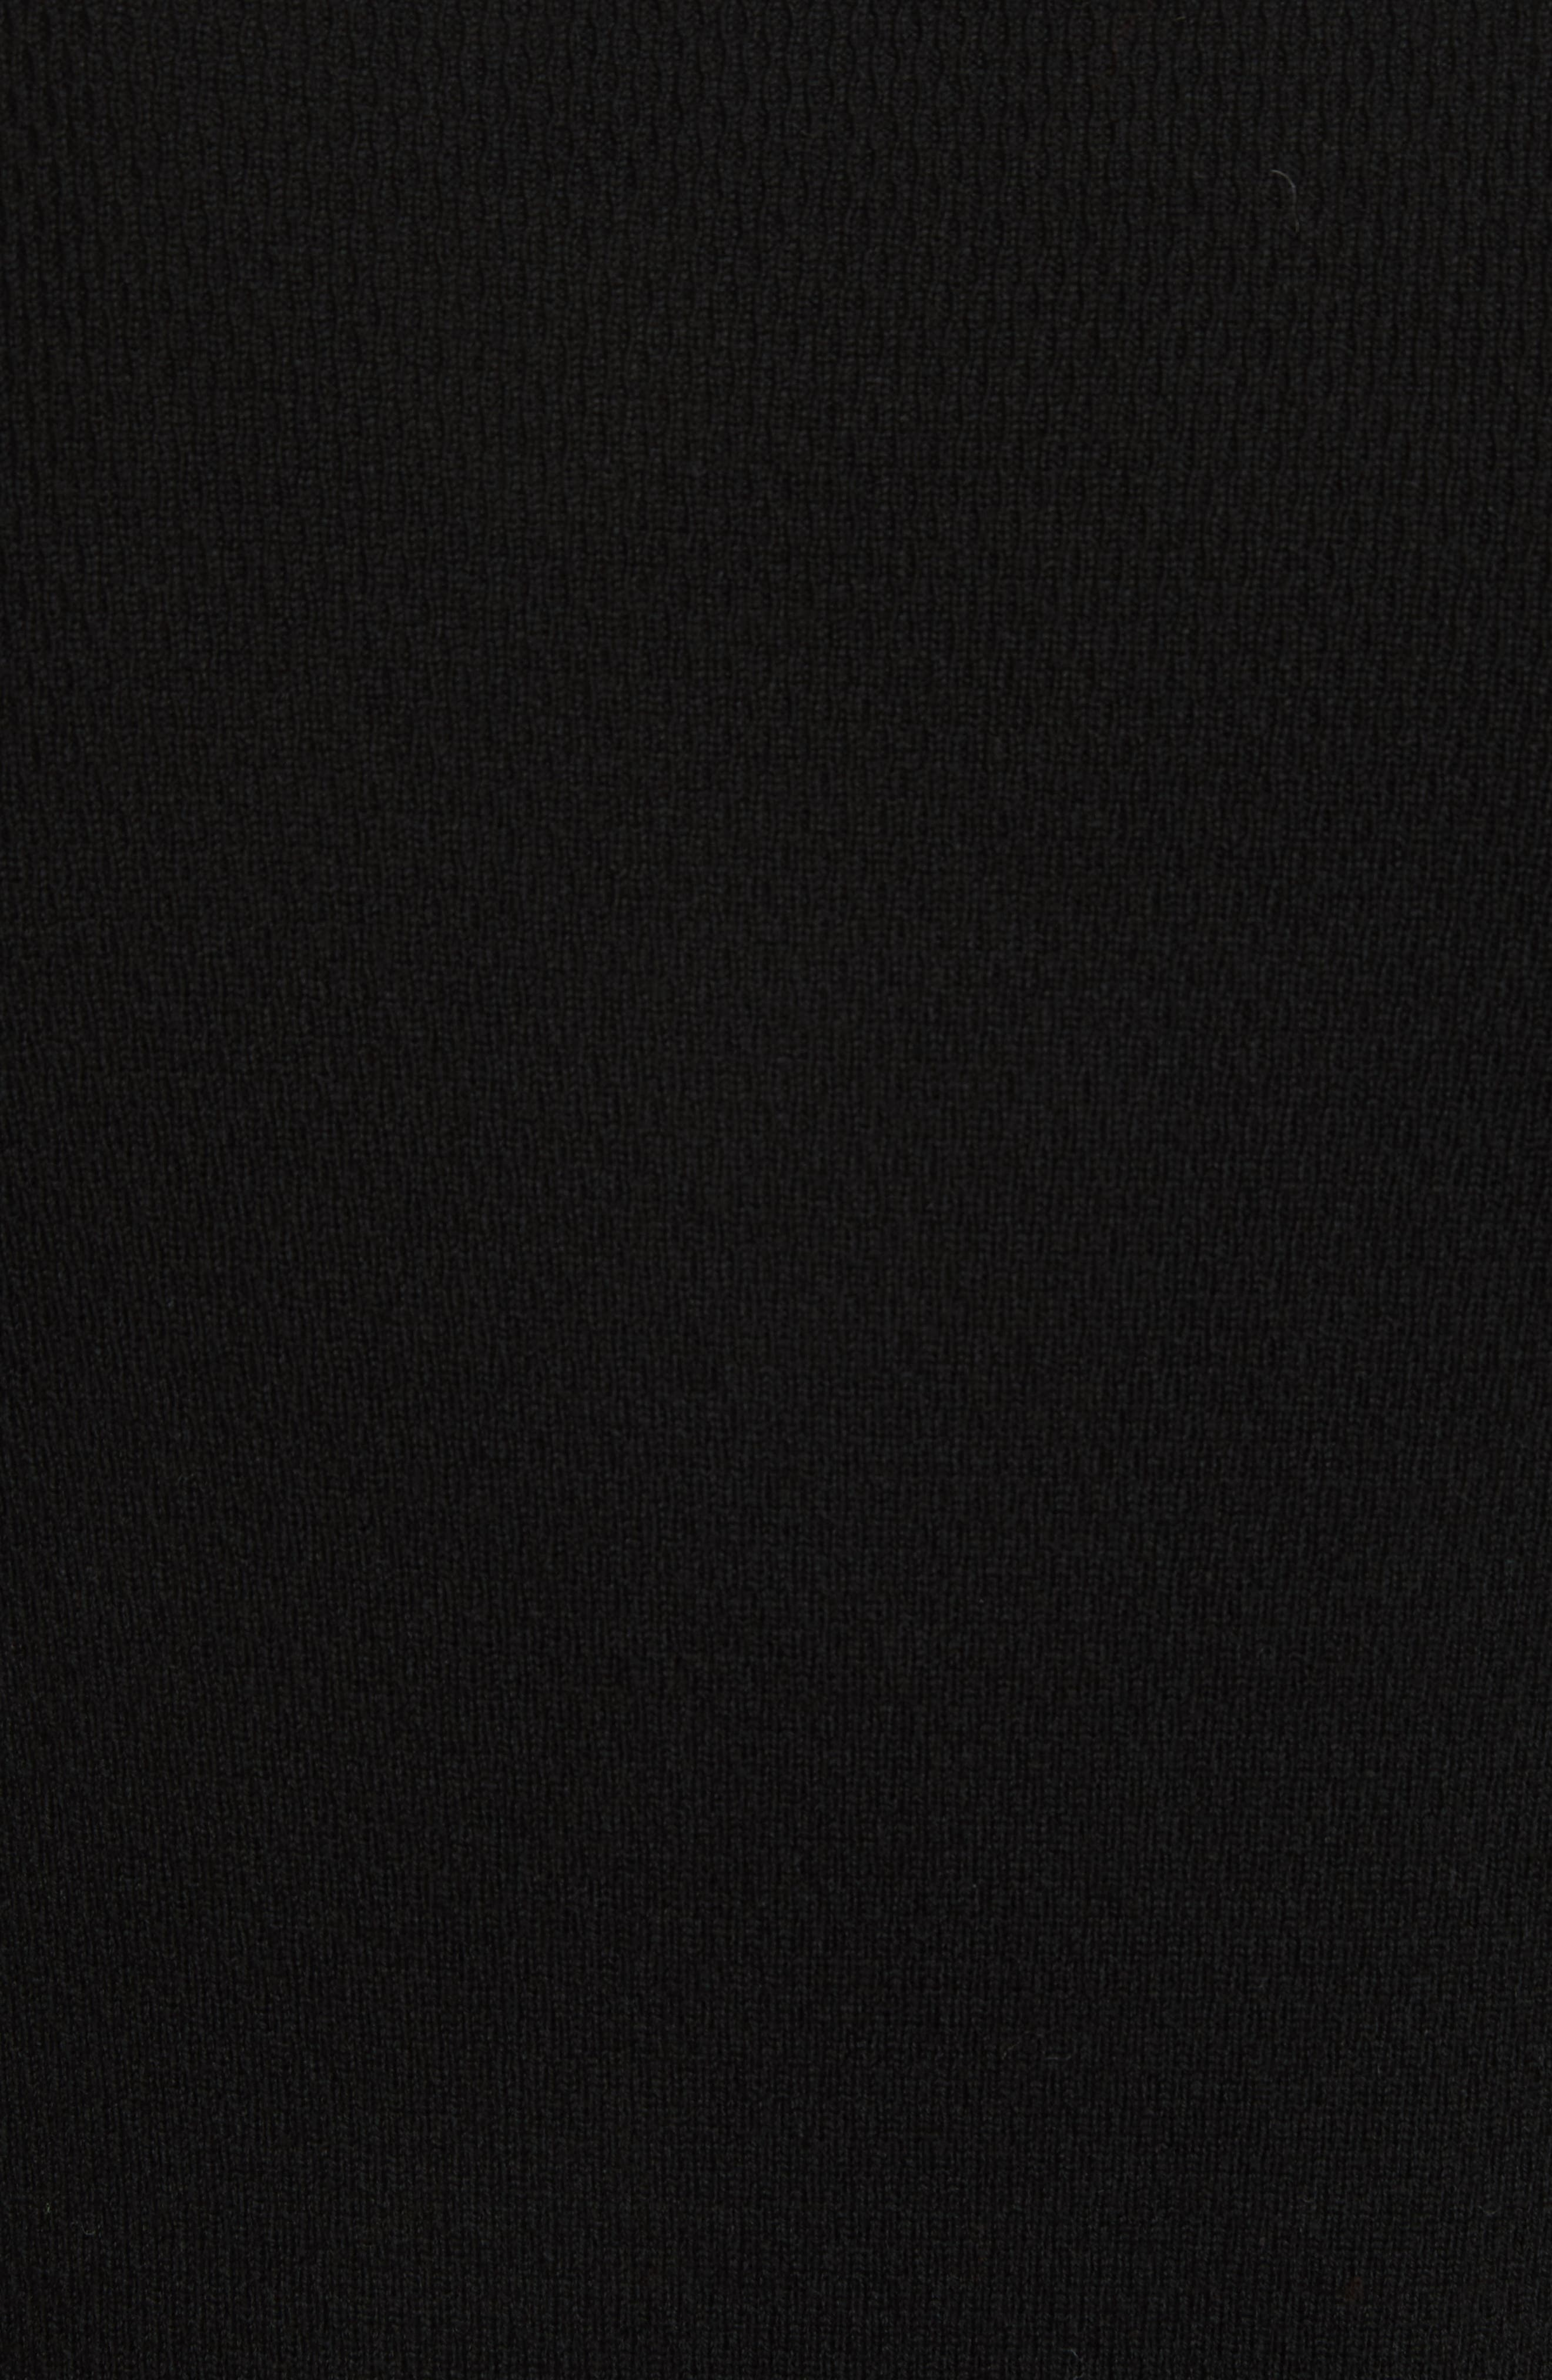 Gregory Crewneck Sweater,                             Alternate thumbnail 5, color,                             Black